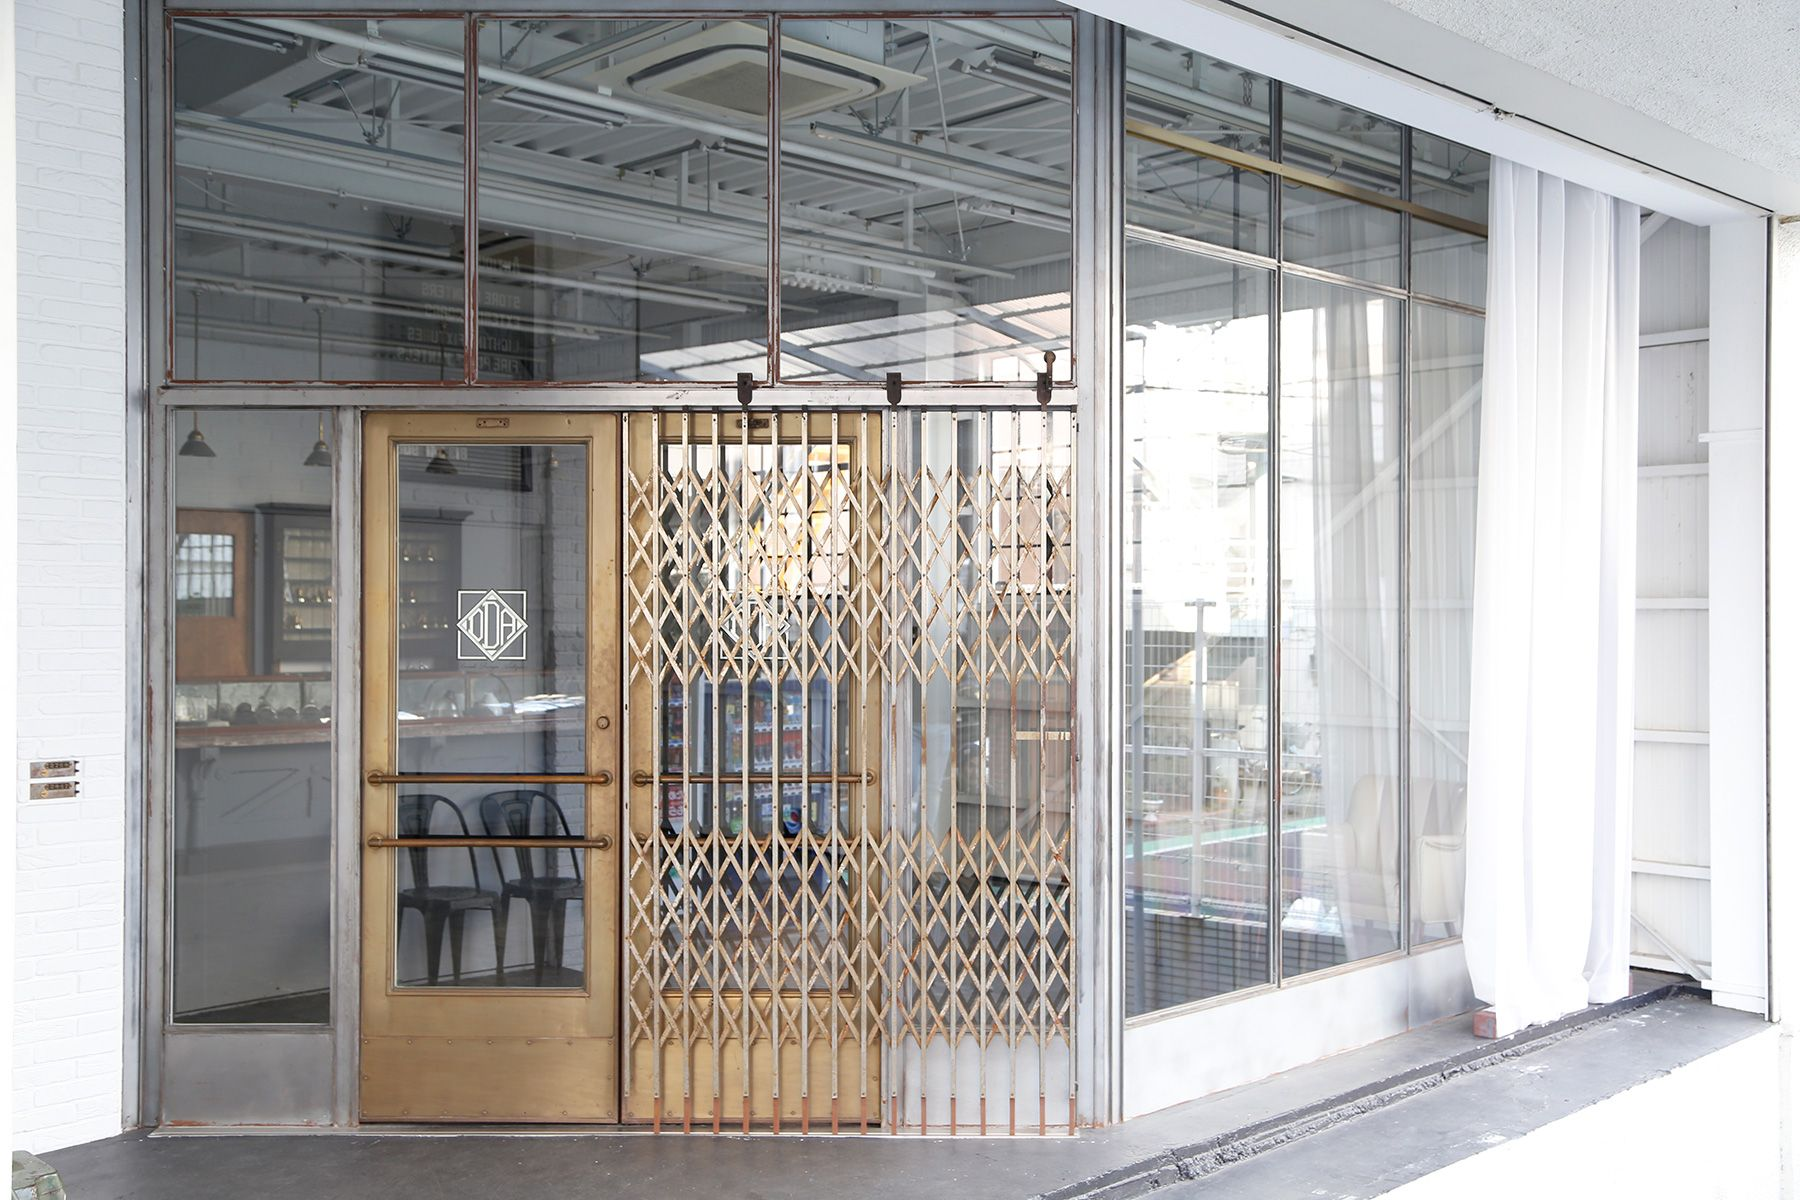 DECADE(ディケード) /FUJIYAMA LOCATION SERVICES